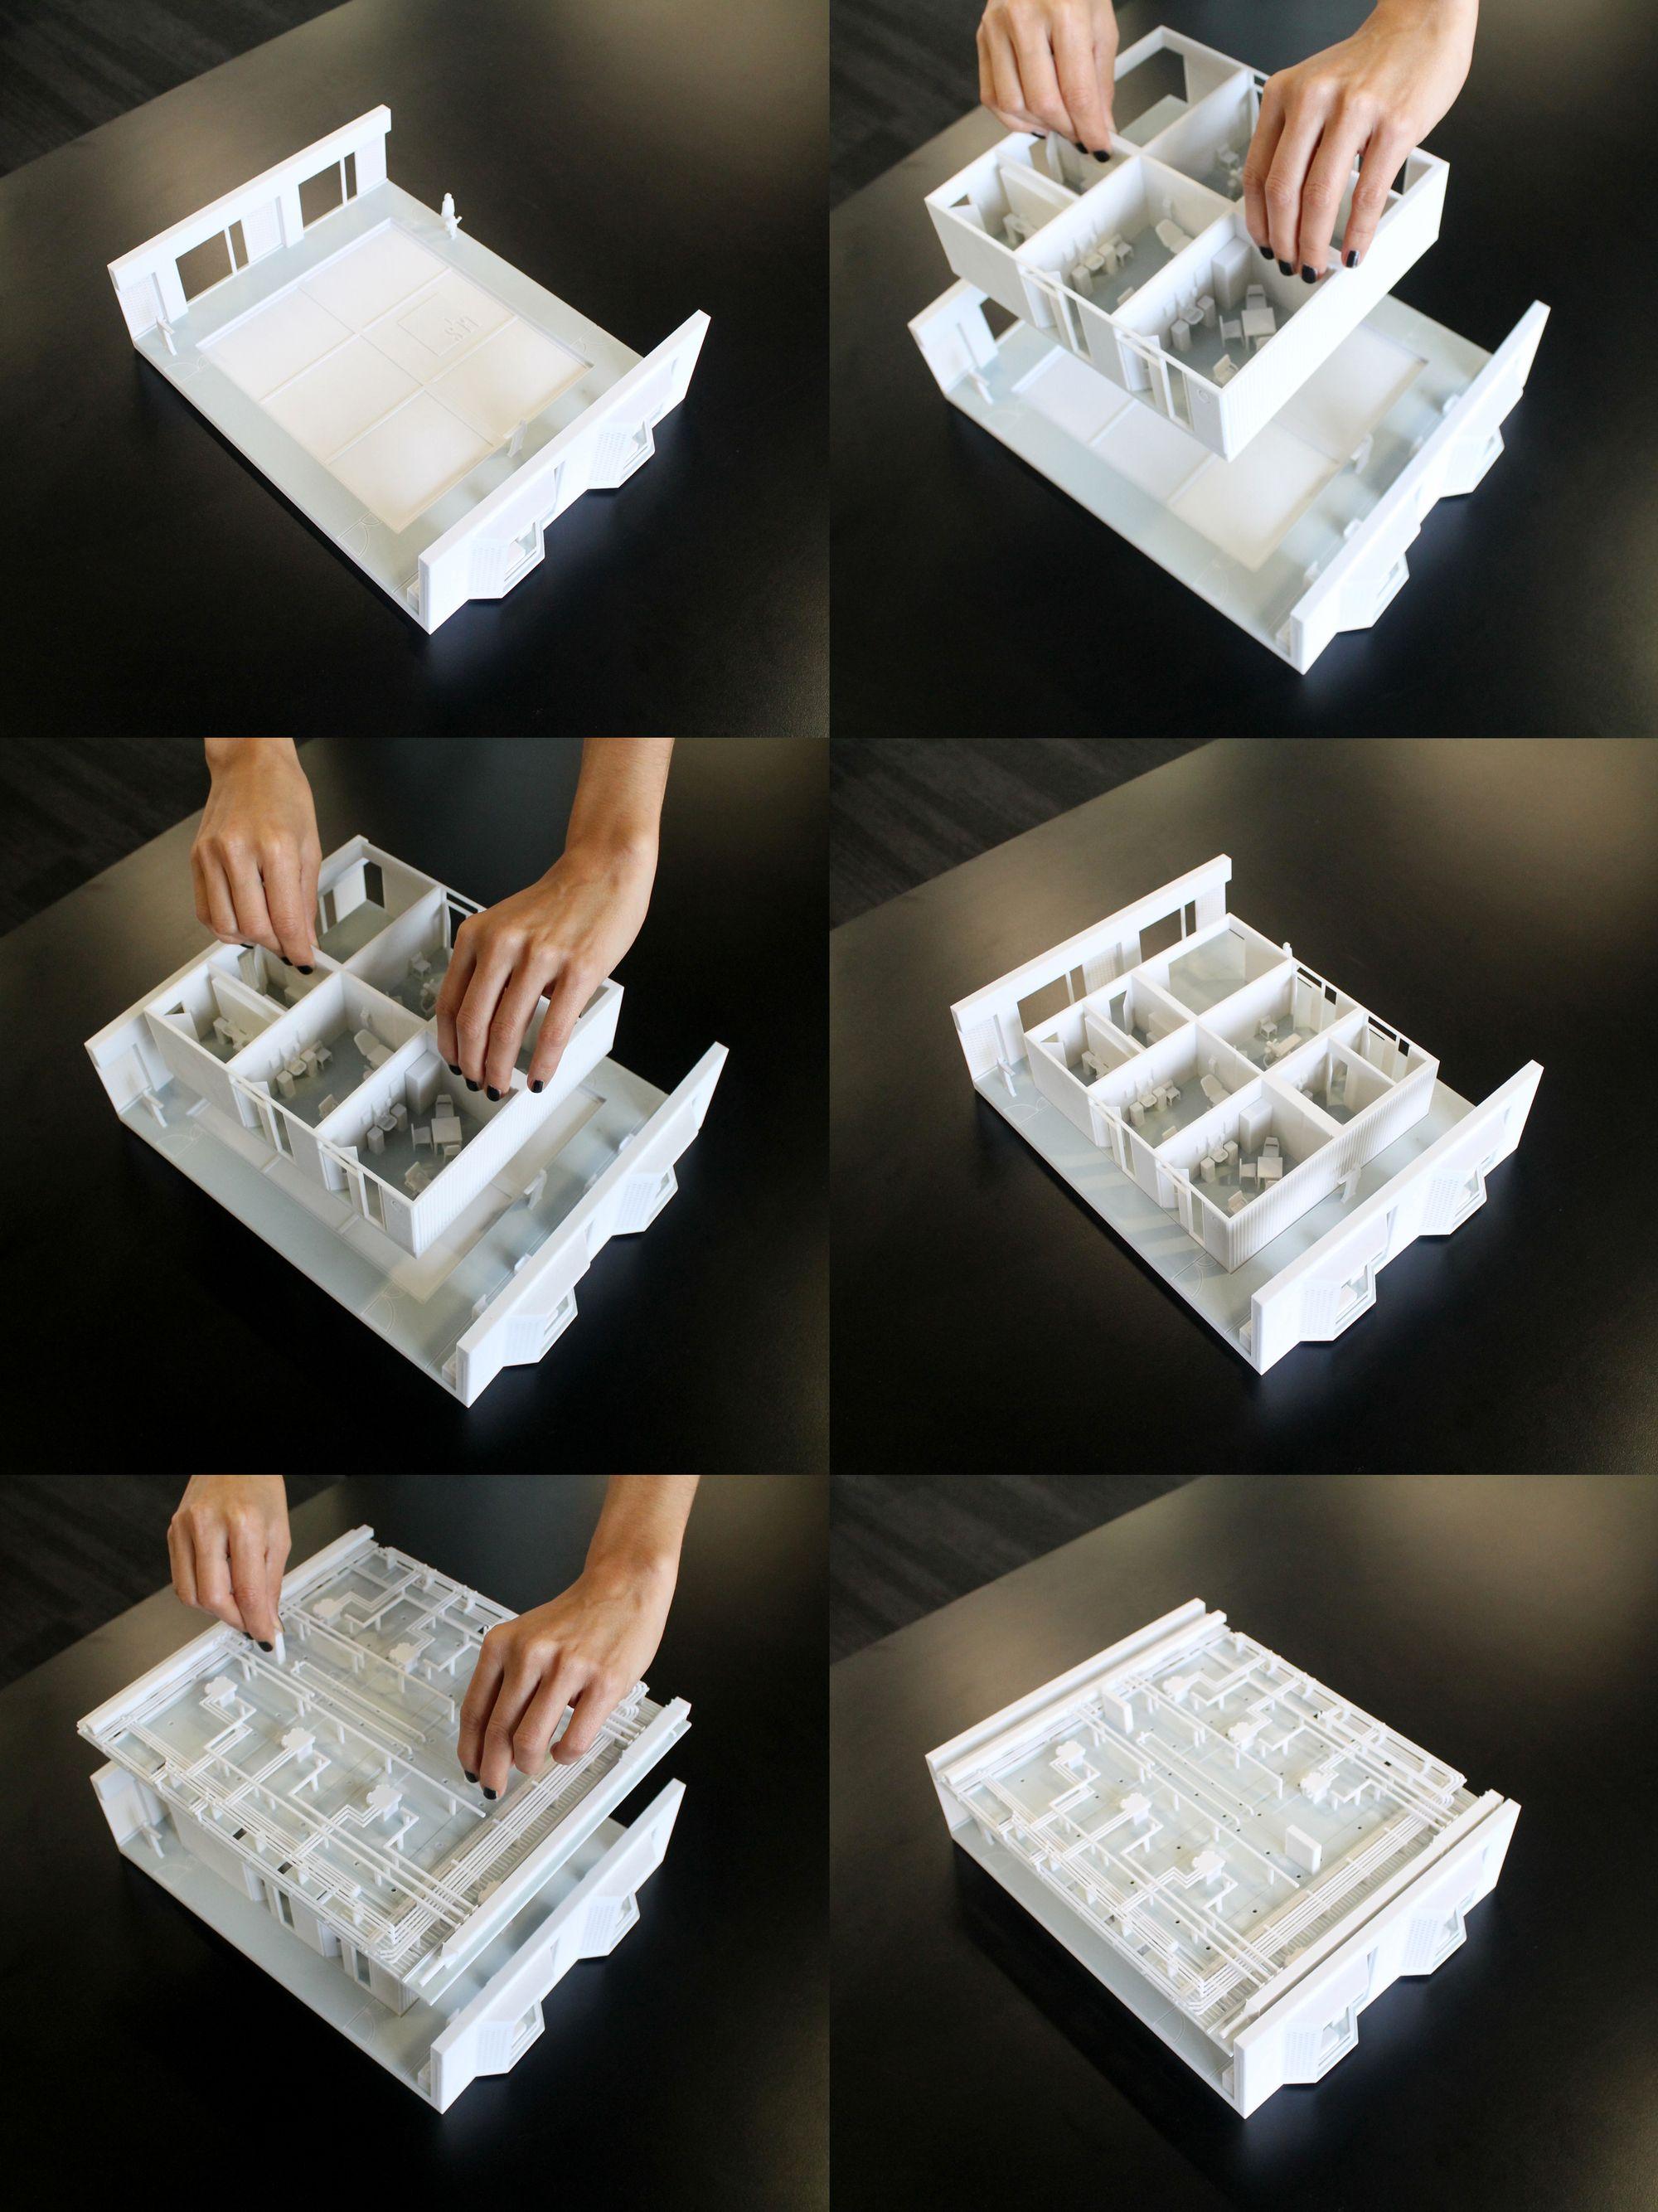 Digital Craft 3D Printing for Architectural Design 3d